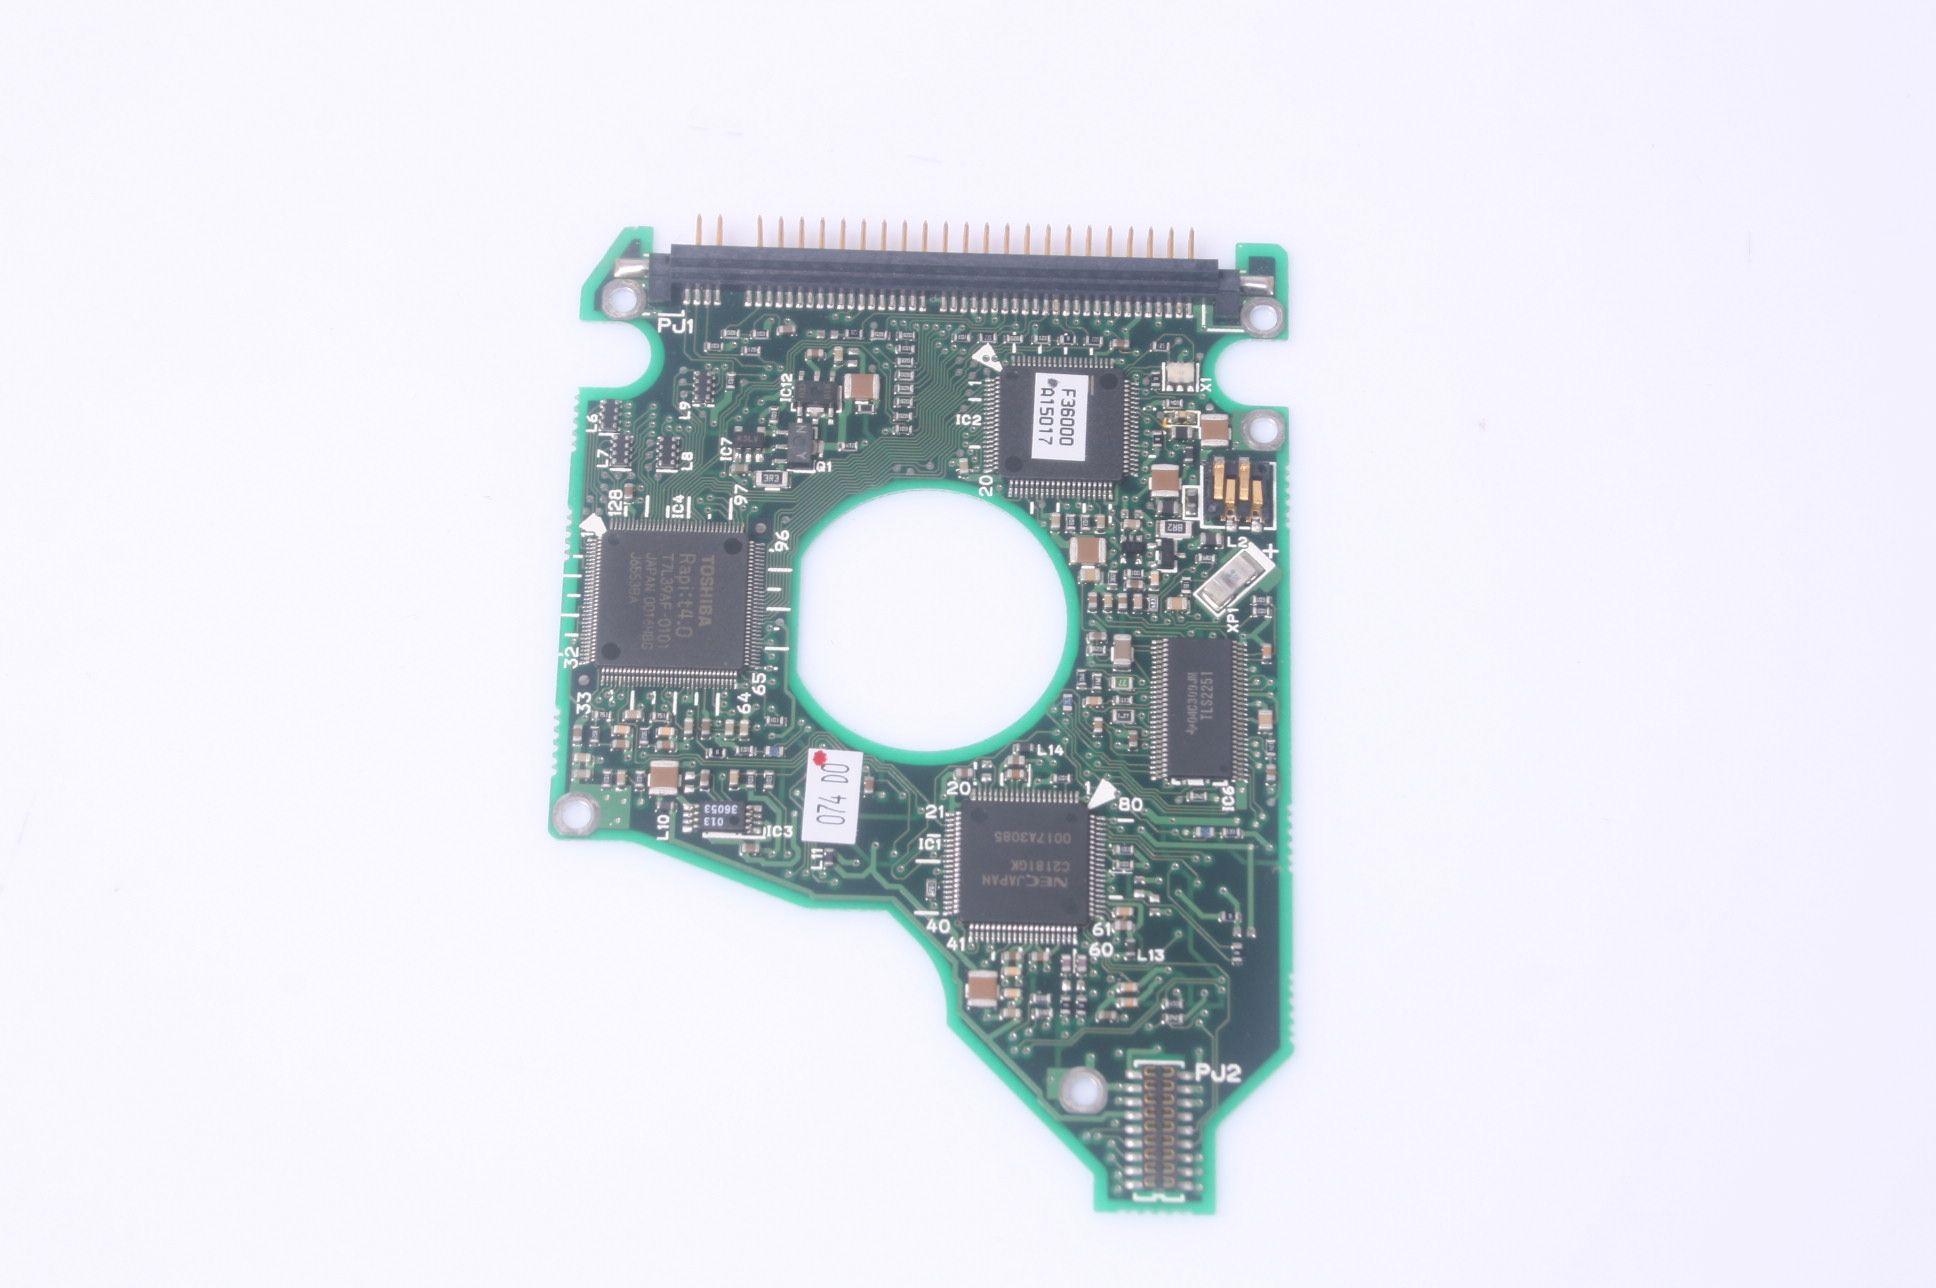 TOSHIBA MK6014MAP 6GB 2.5 IDE HARD DRIVE / PCB (CIRCUIT BOARD) ONLY FOR DA